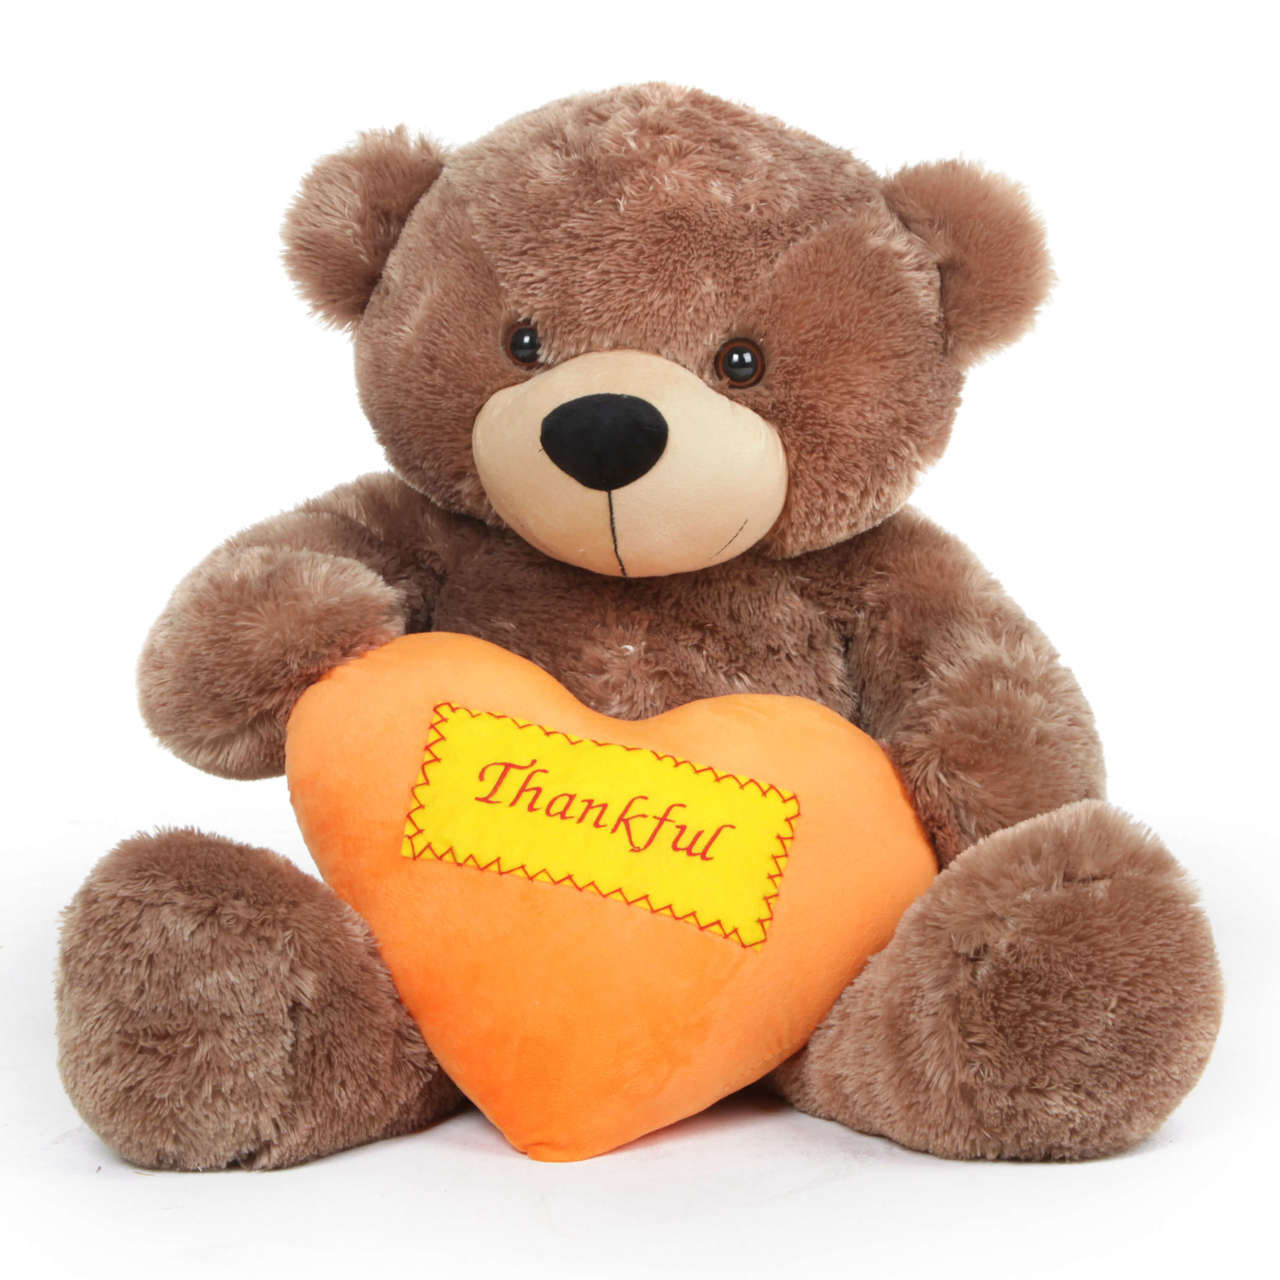 Big Brown Thanksgiving Teddy Bear Gift